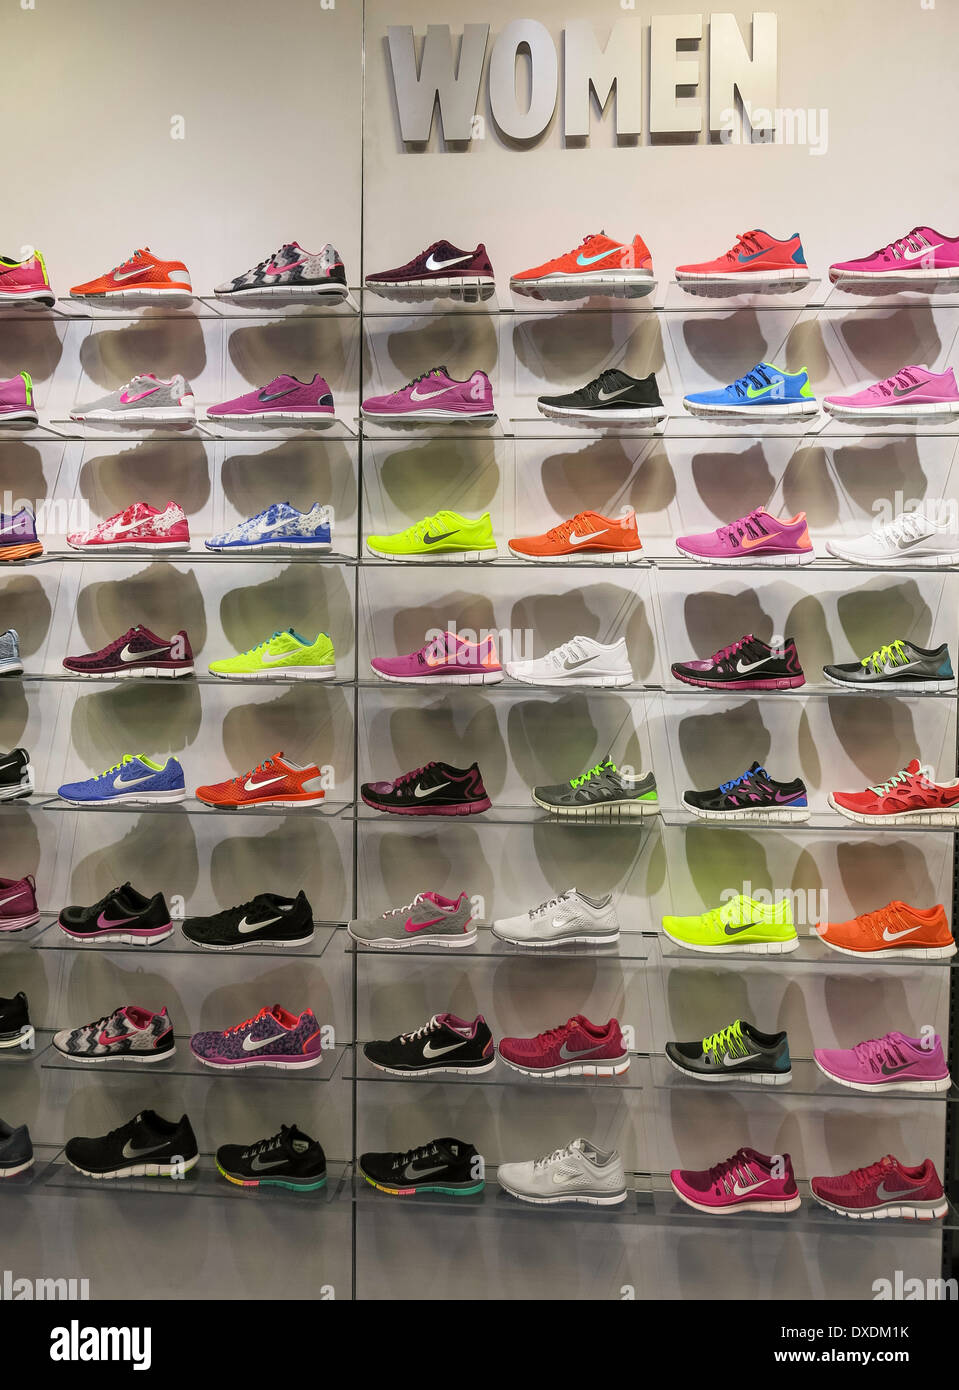 ed1b7c6685 Nike Woman's Athletic Shoe Wall, Foot Locker, International Plaza, Tampa,  FL, USA